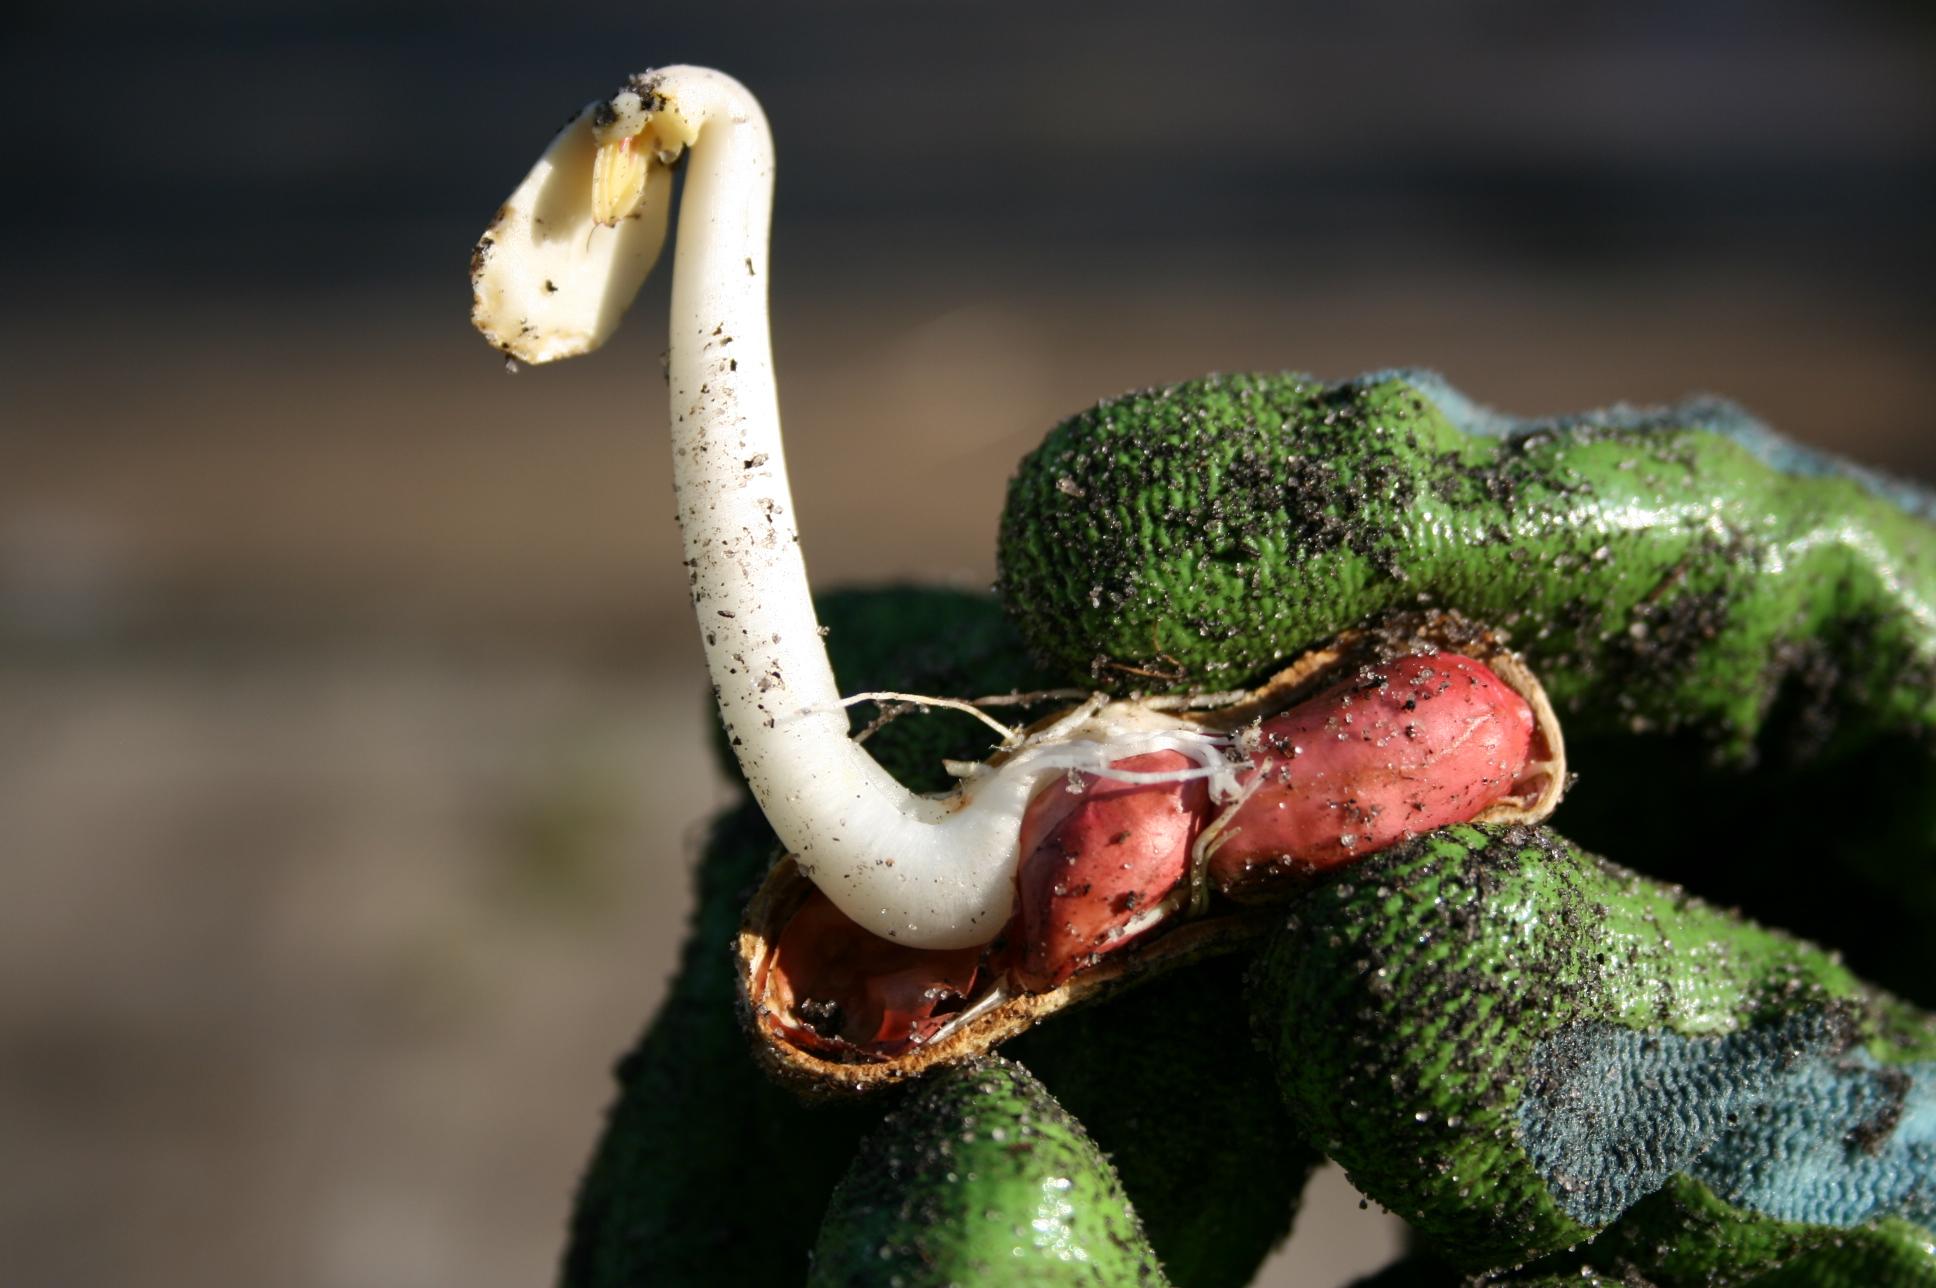 how peanuts grow - photo#32